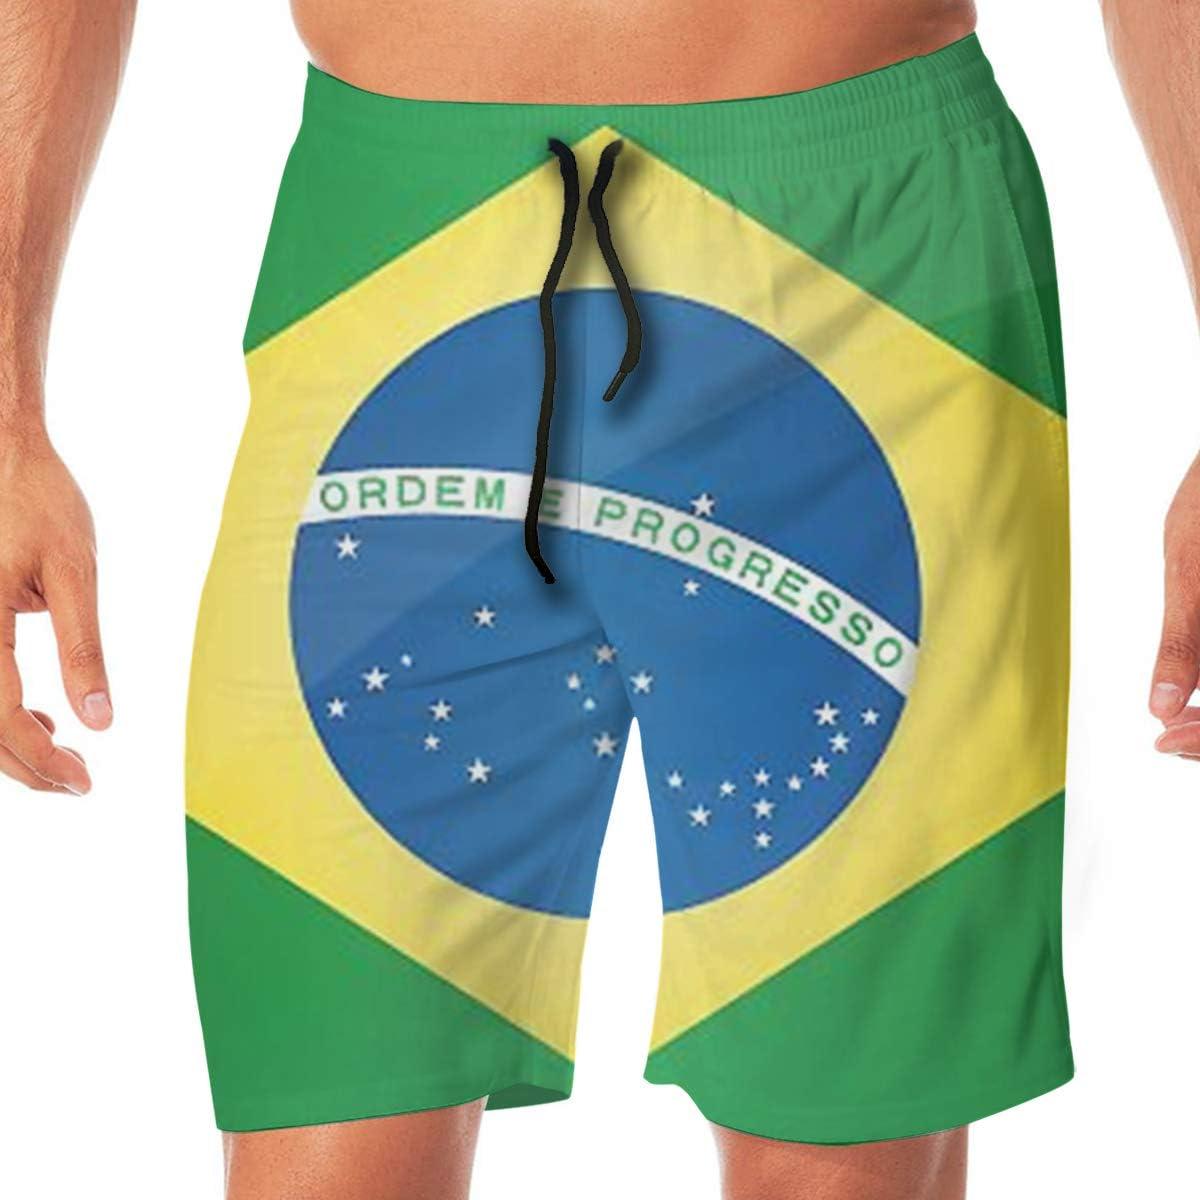 MaoYTUI Brazil Flag Mens Swim Trunks Boys Quick Dry Bathing Suits Drawstring Waist Beach Broad Shorts Swim Suit Beachwear with Mesh Lining